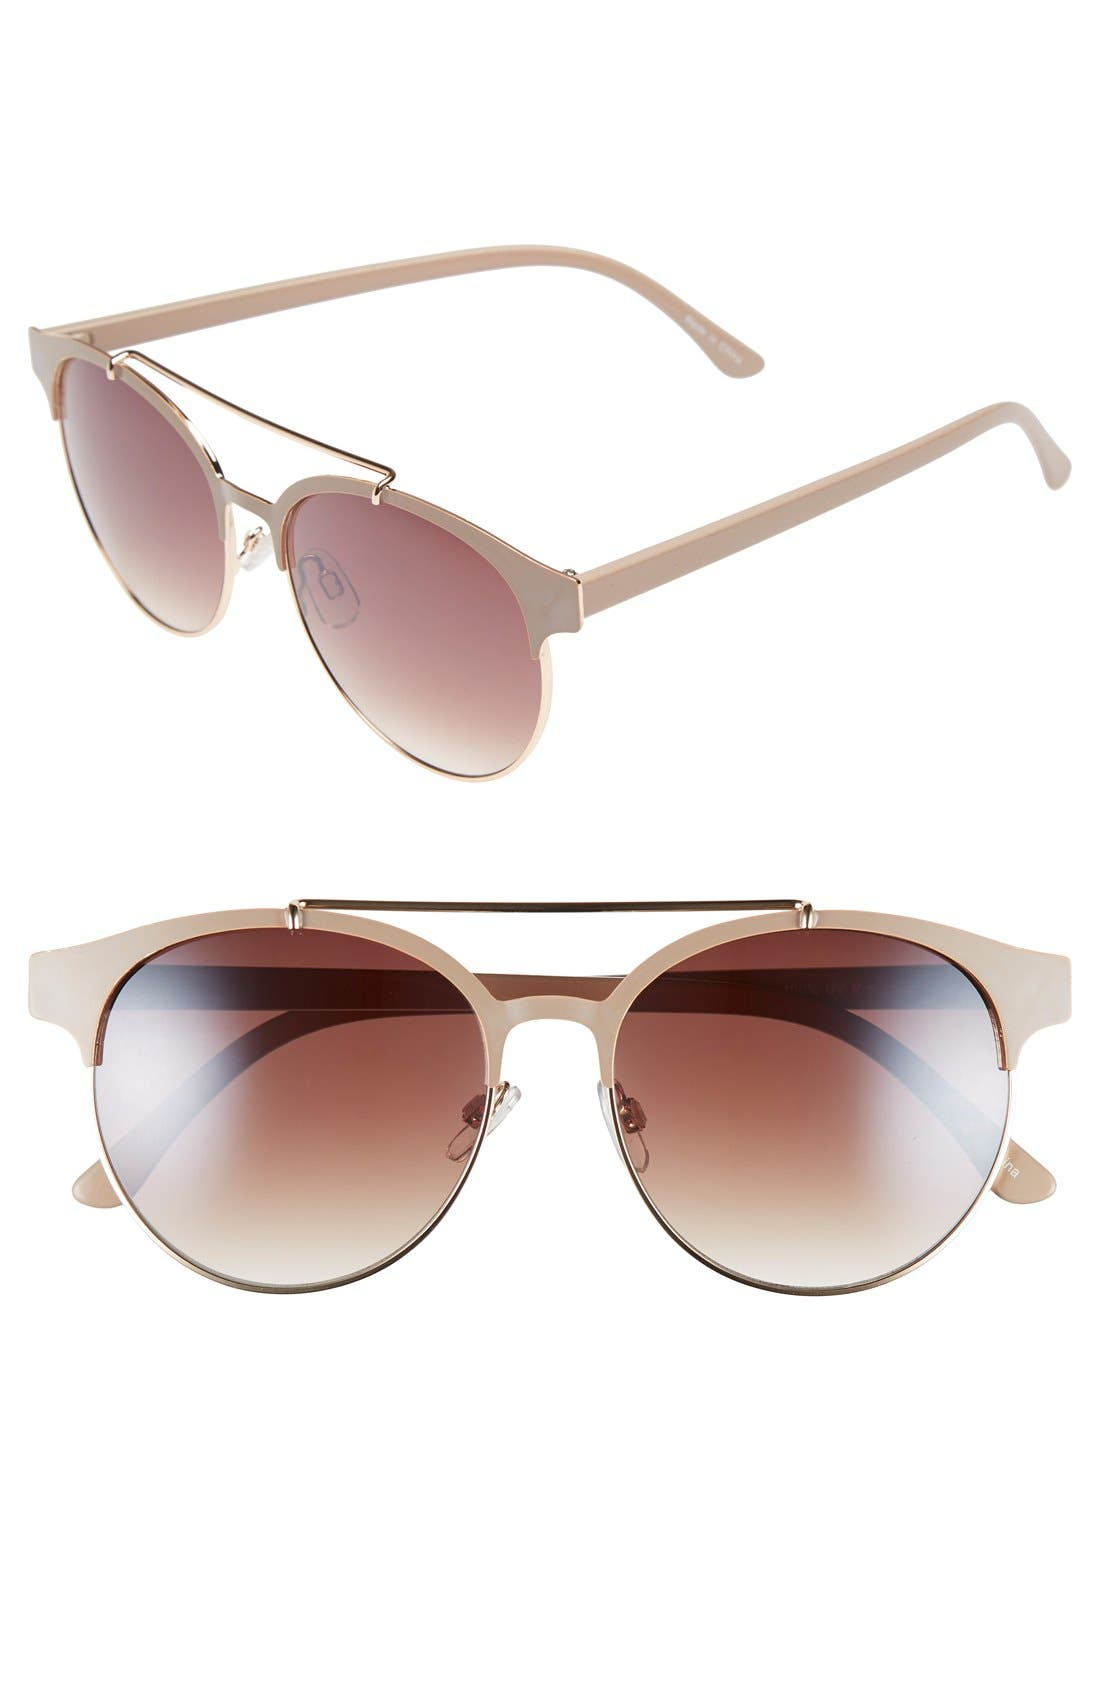 55mm Round Sunglasses,                             Main thumbnail 3, color,